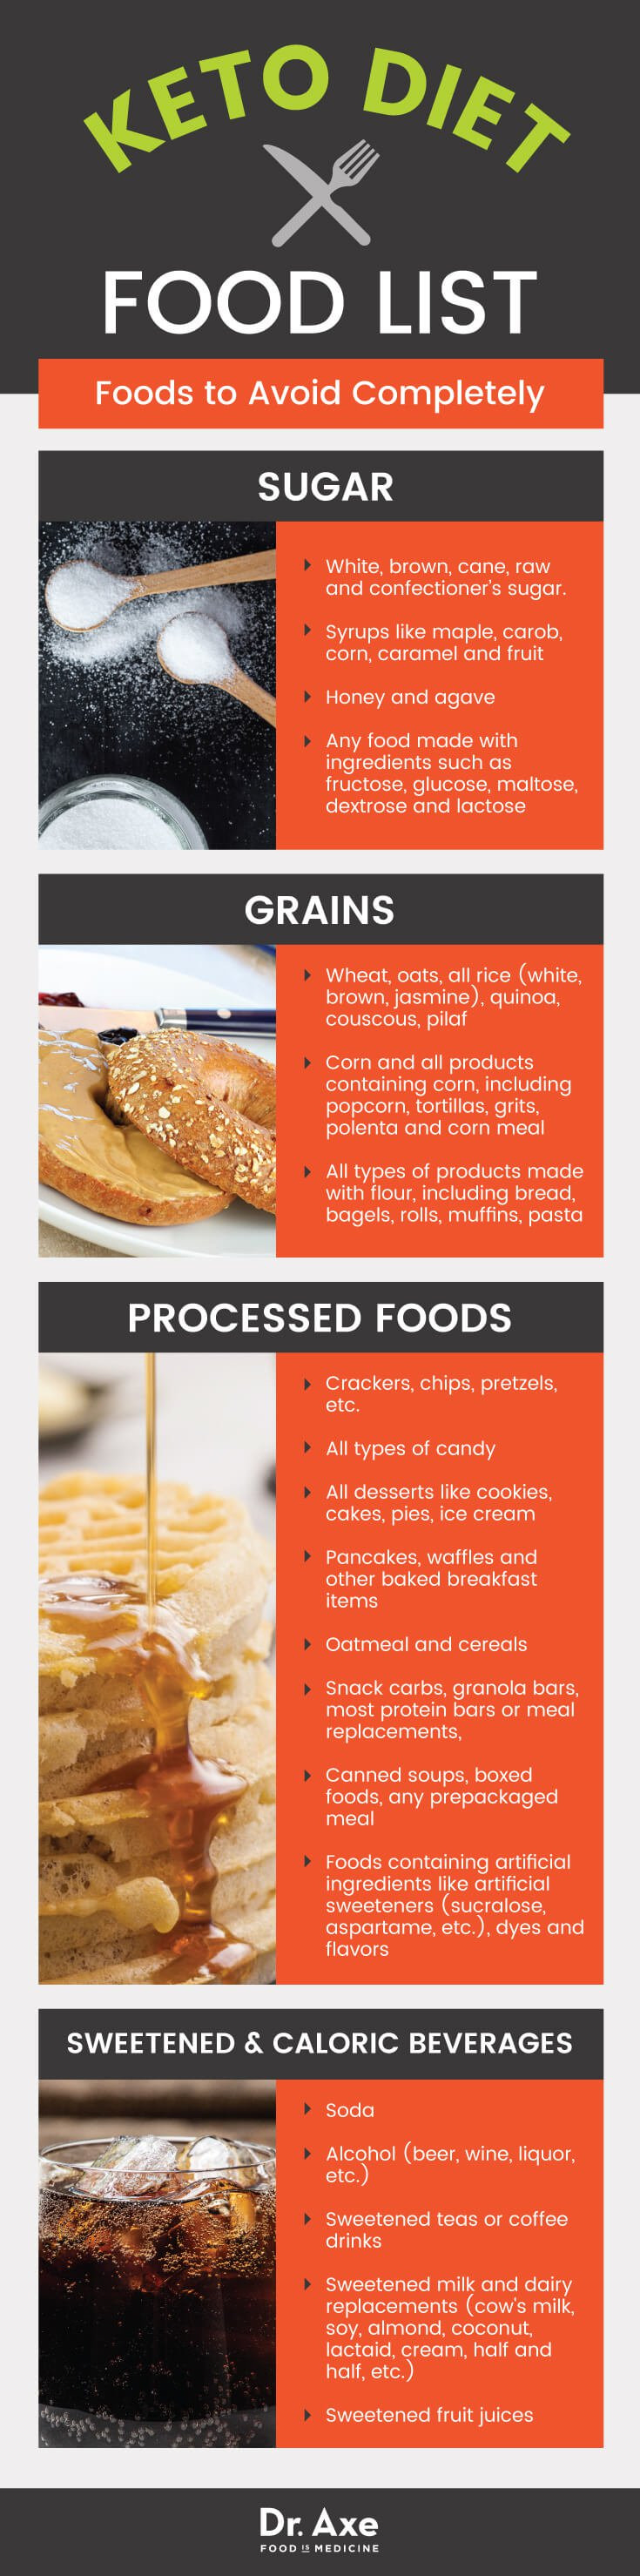 Is Keto Diet Good  Ketogenic Diet Food List Including Best vs Worst Keto